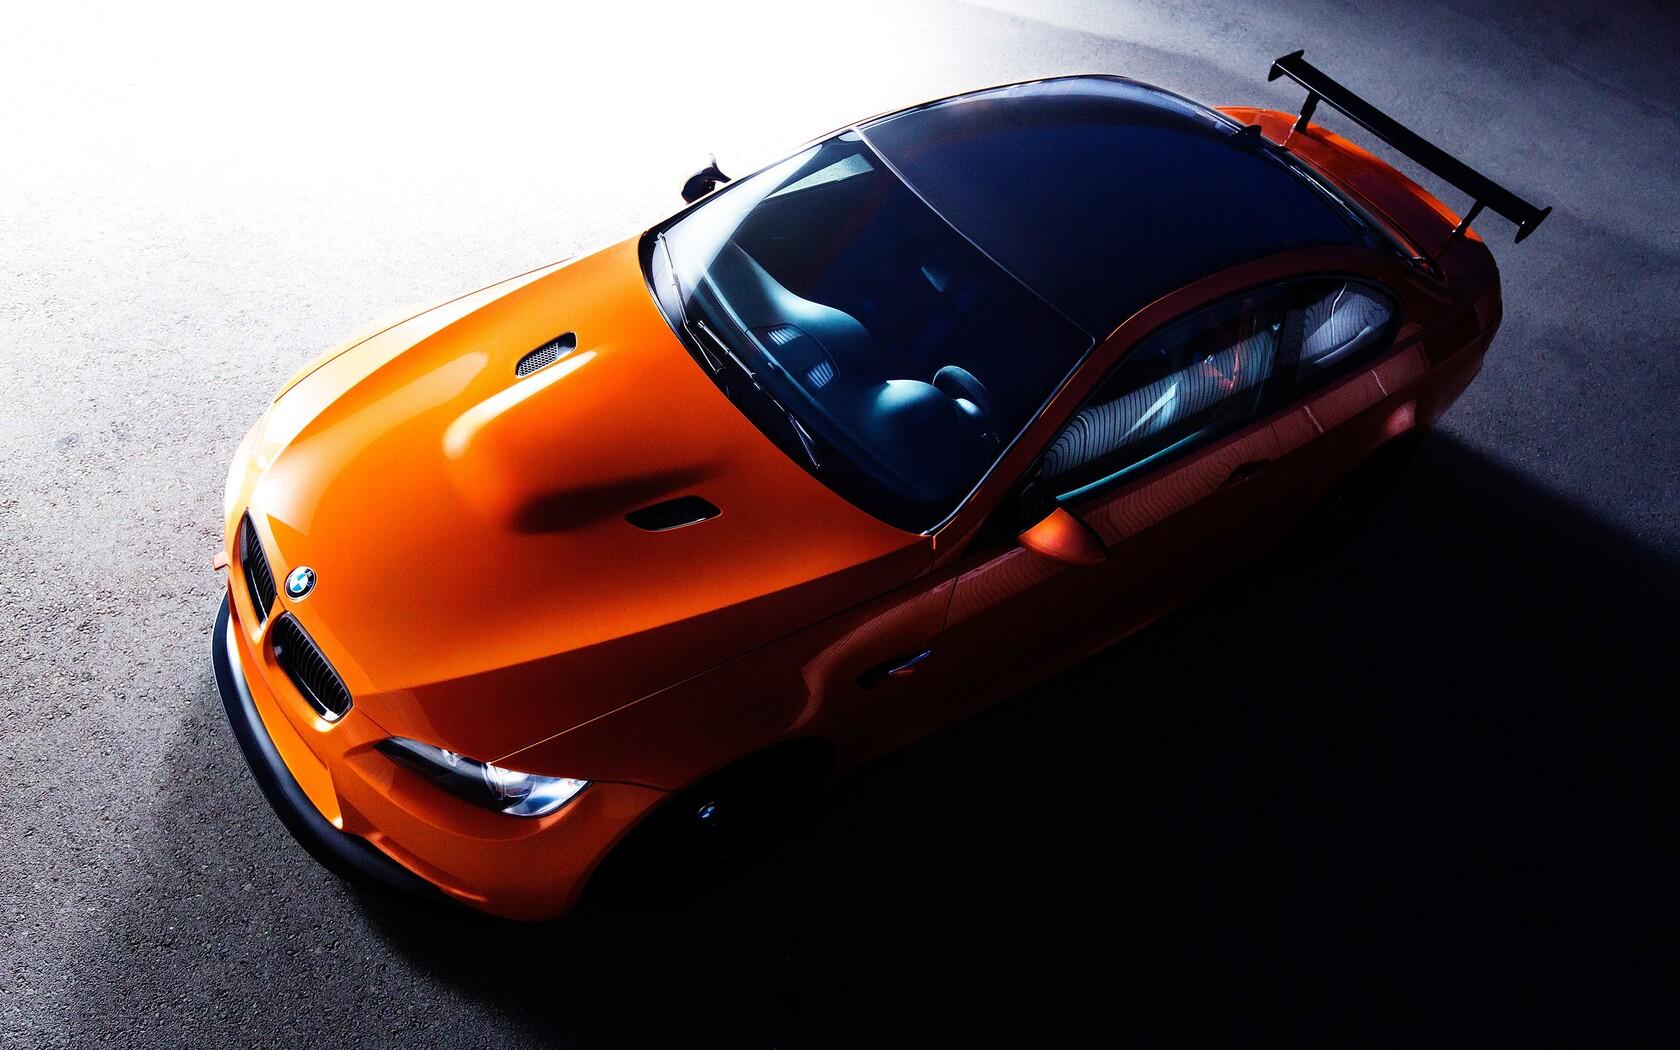 bmw-sports-car-4k.jpg